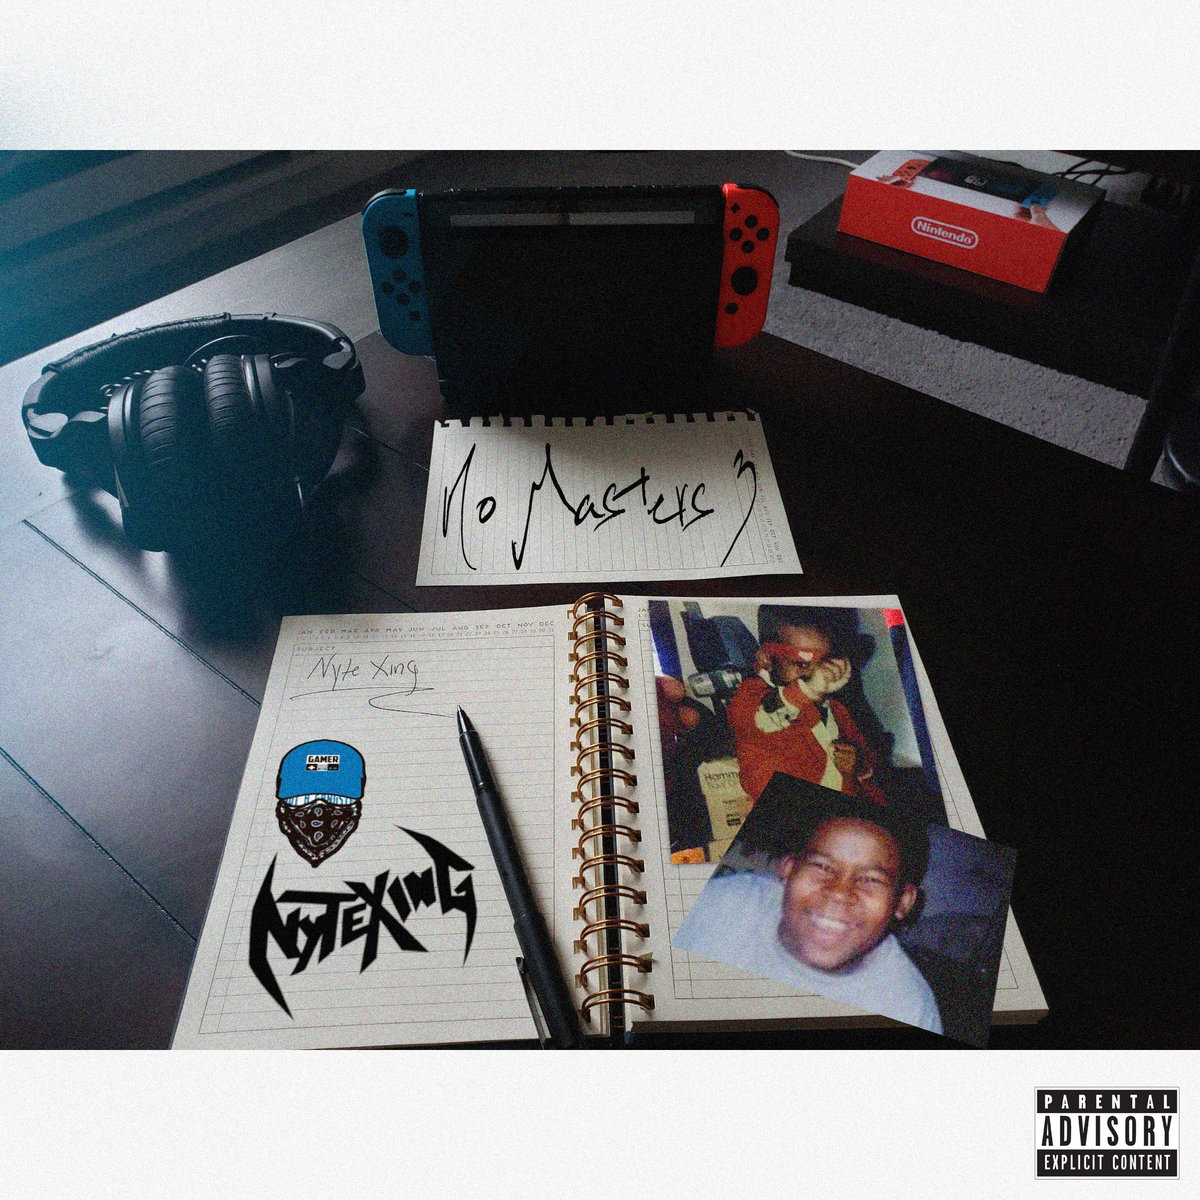 GR3YS0N (F.K.A. NyteXing) – No Masters 3